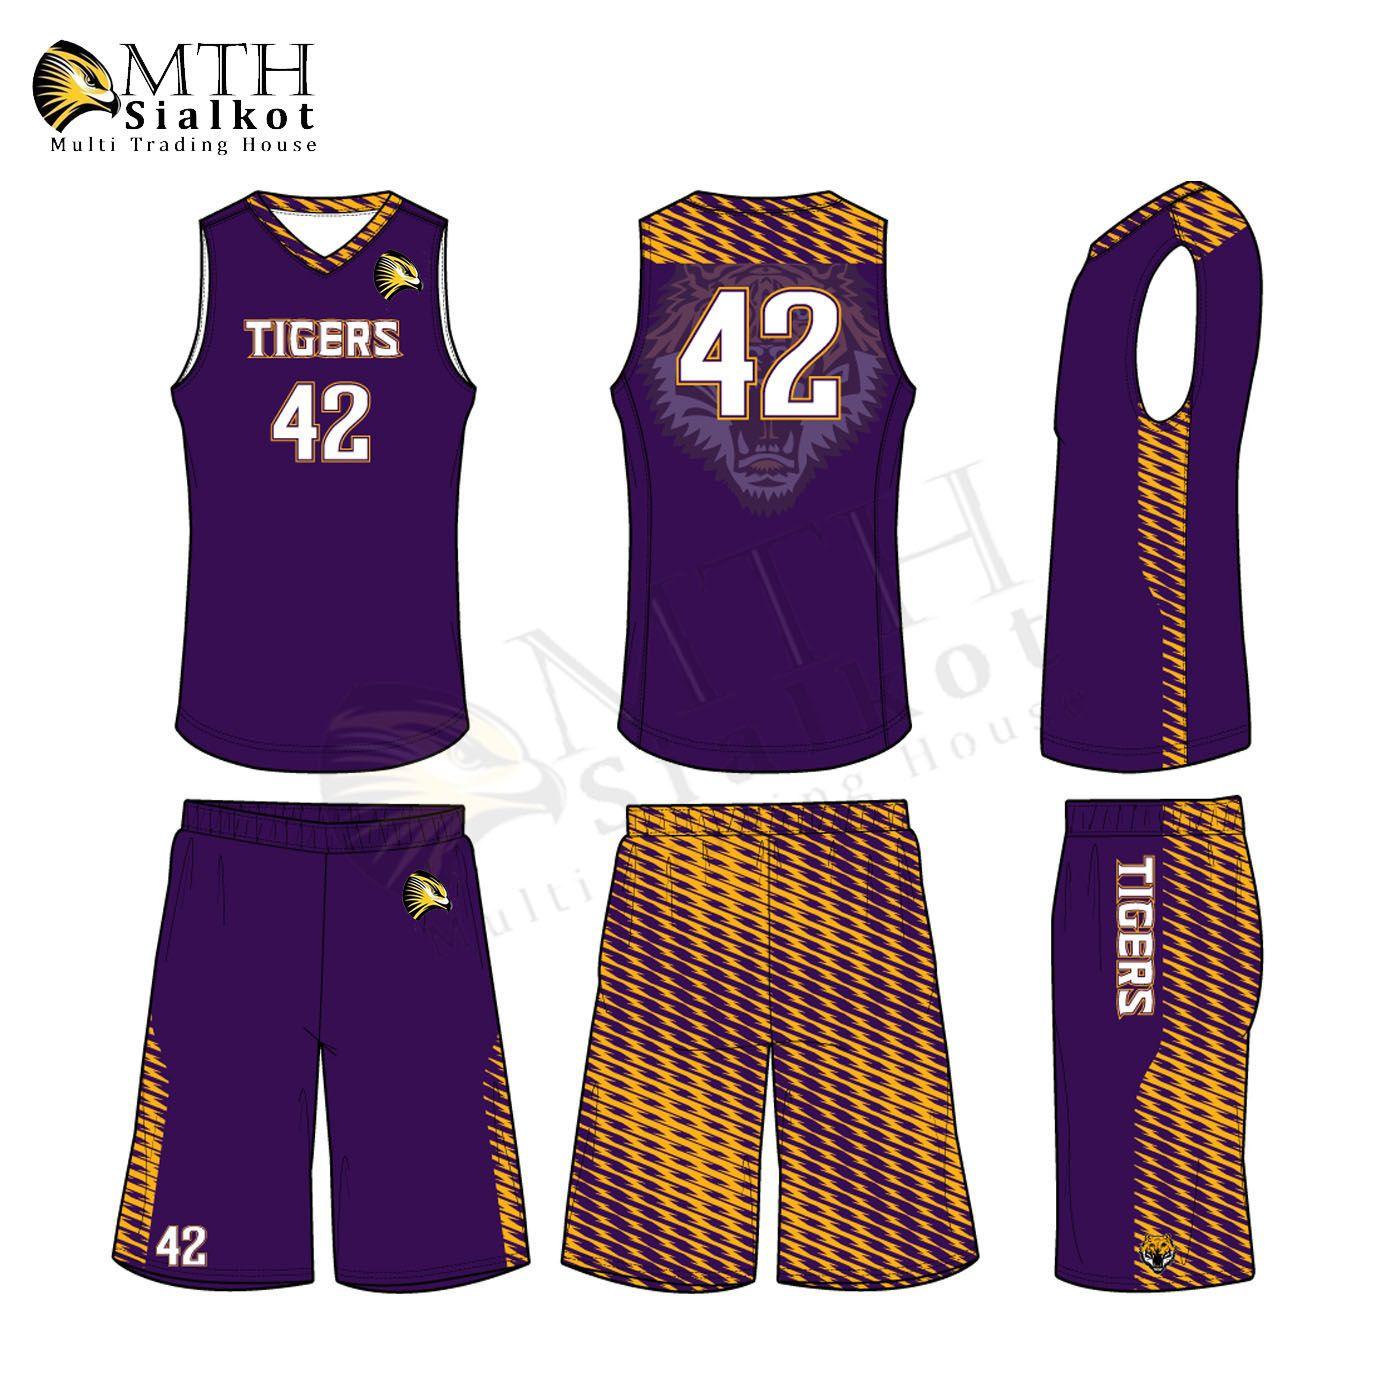 9a9c8e6bc496 Custom Sublimated Basketball Uniforms Order today basketball uniforms